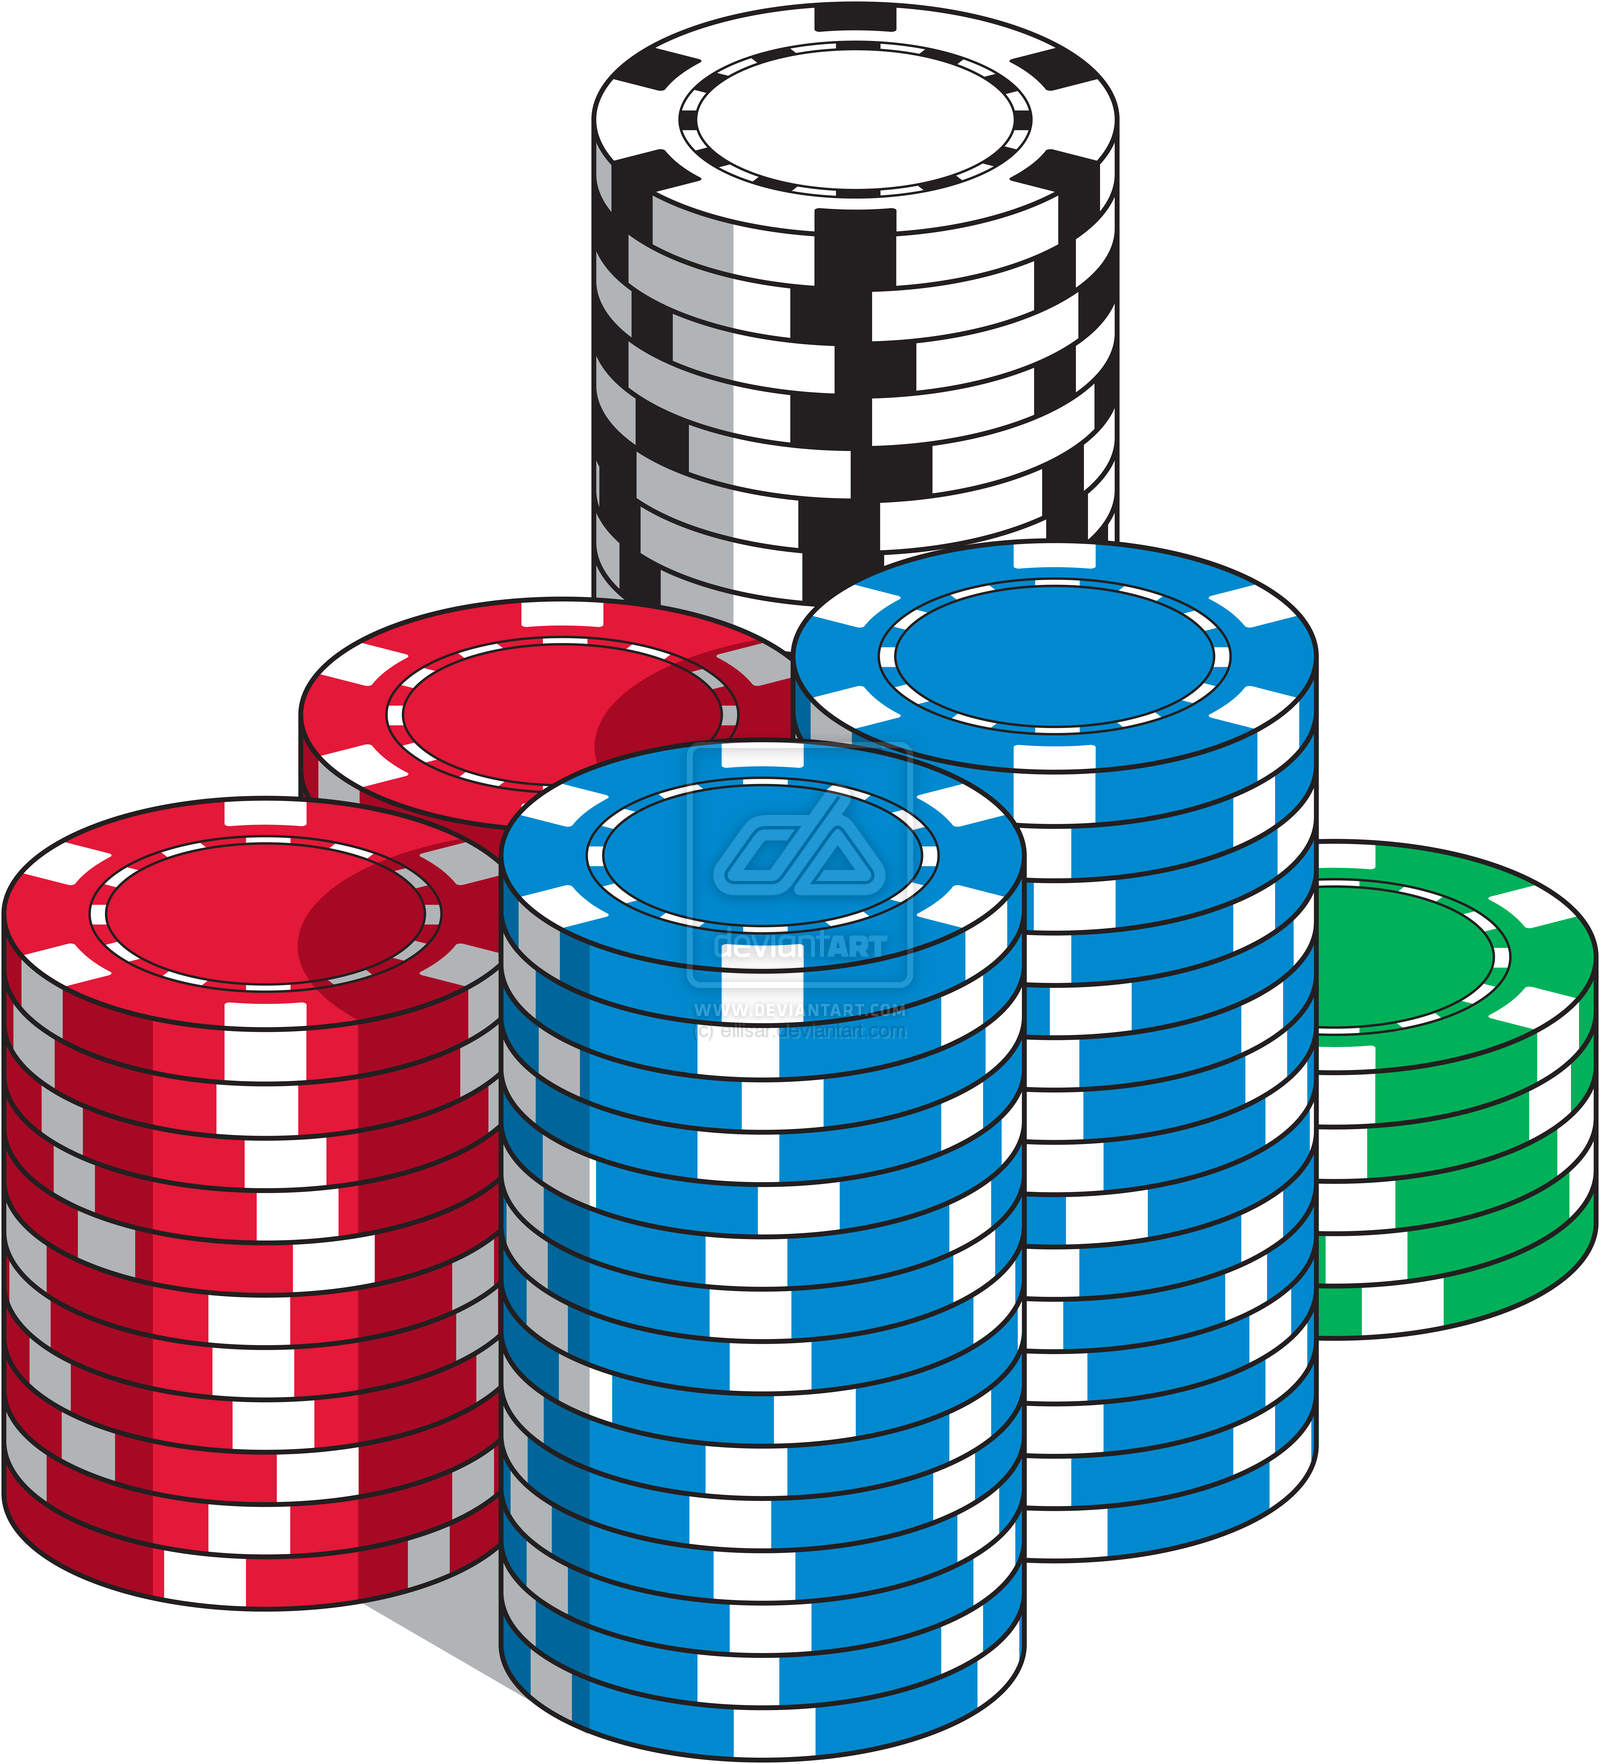 No Deposit Bonus Today Poker Chips Clipa-No Deposit Bonus Today Poker Chips Clipart-0